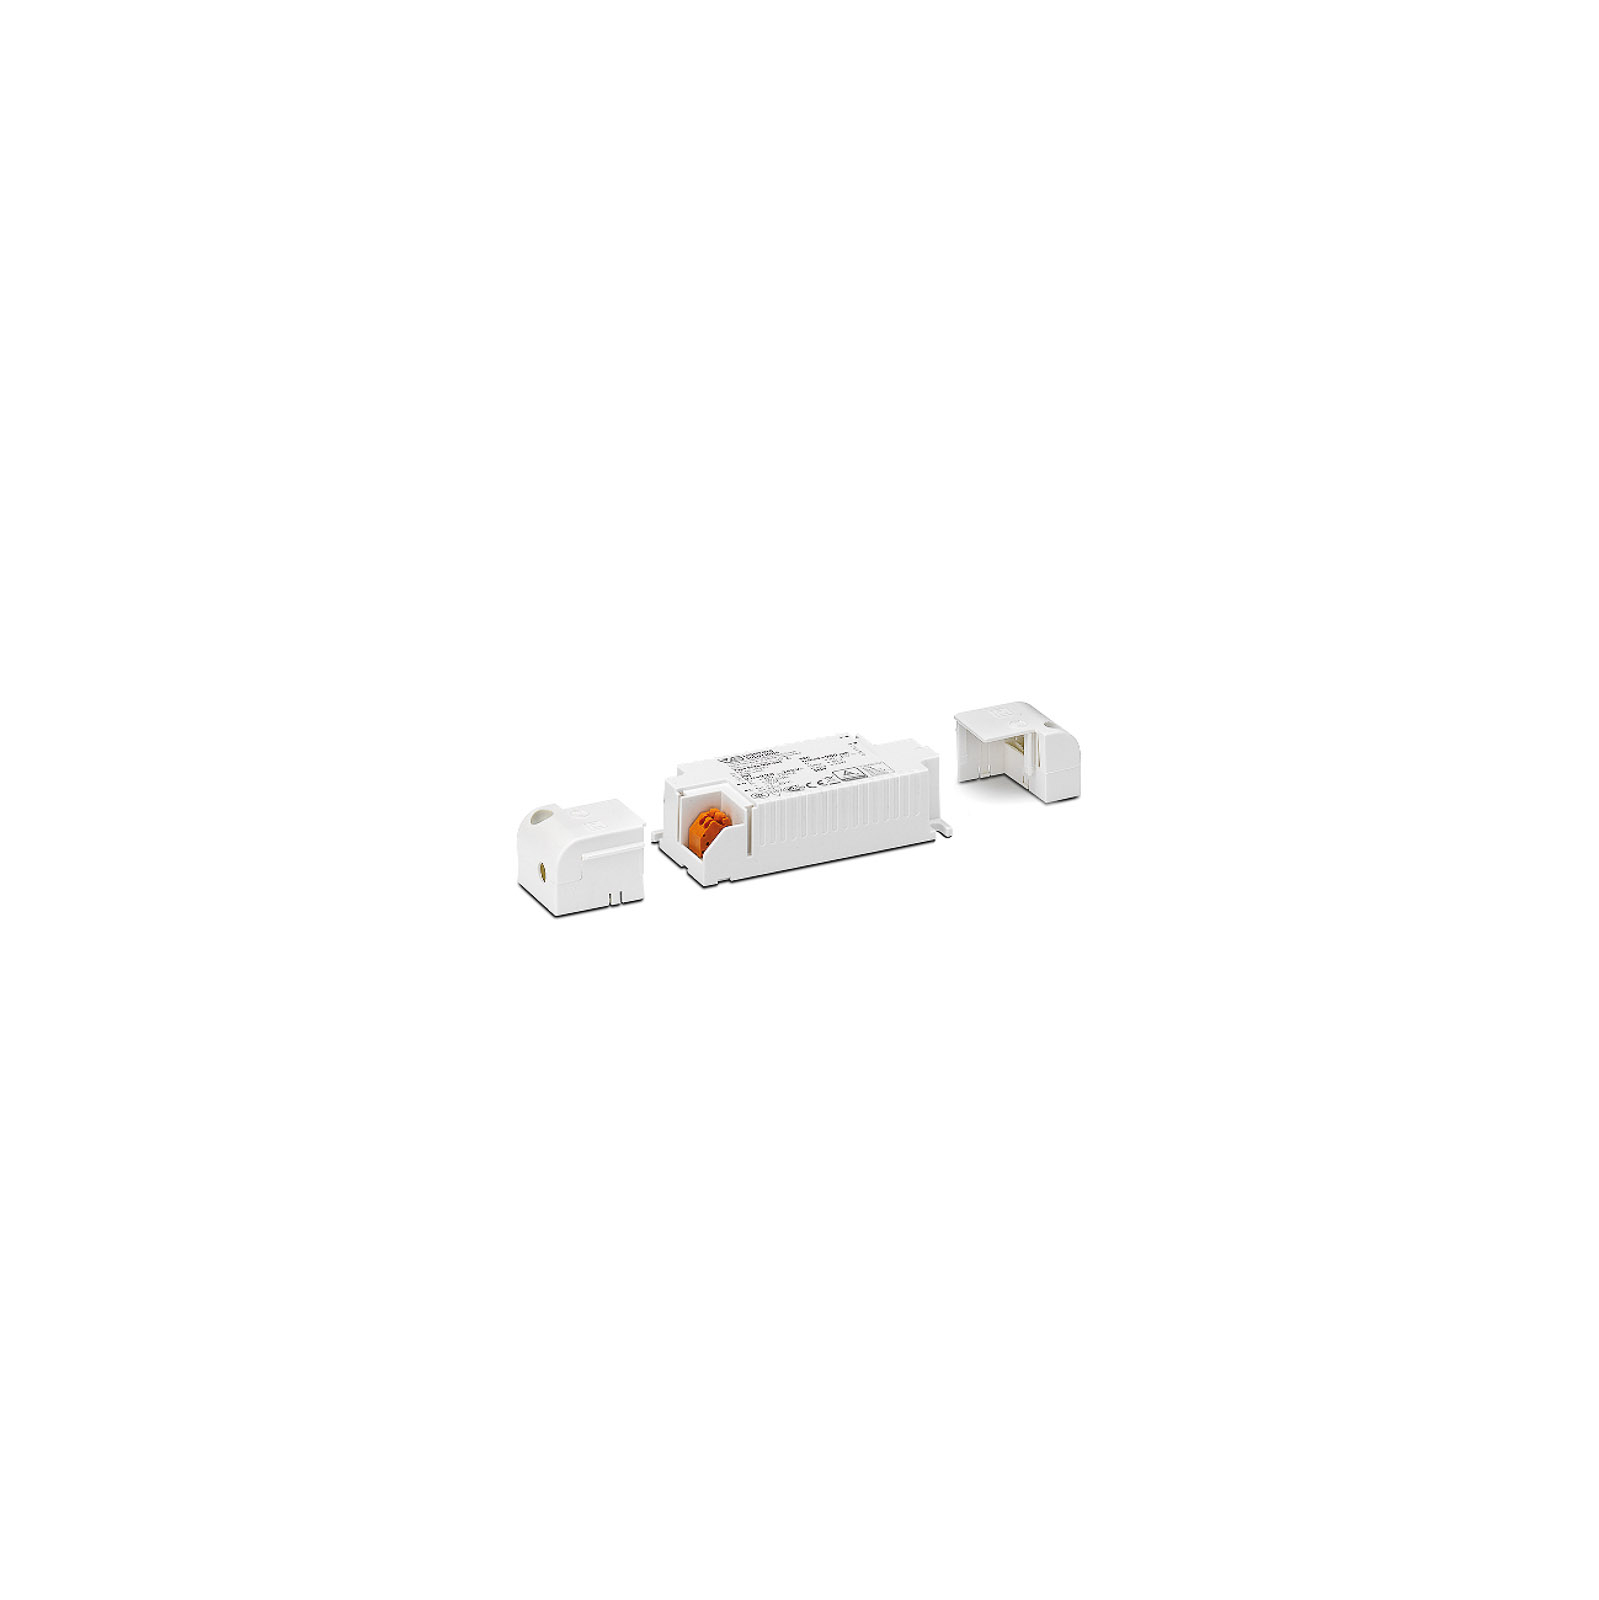 Driver LED max. 28 W, 30-40 V DC, 700 mA